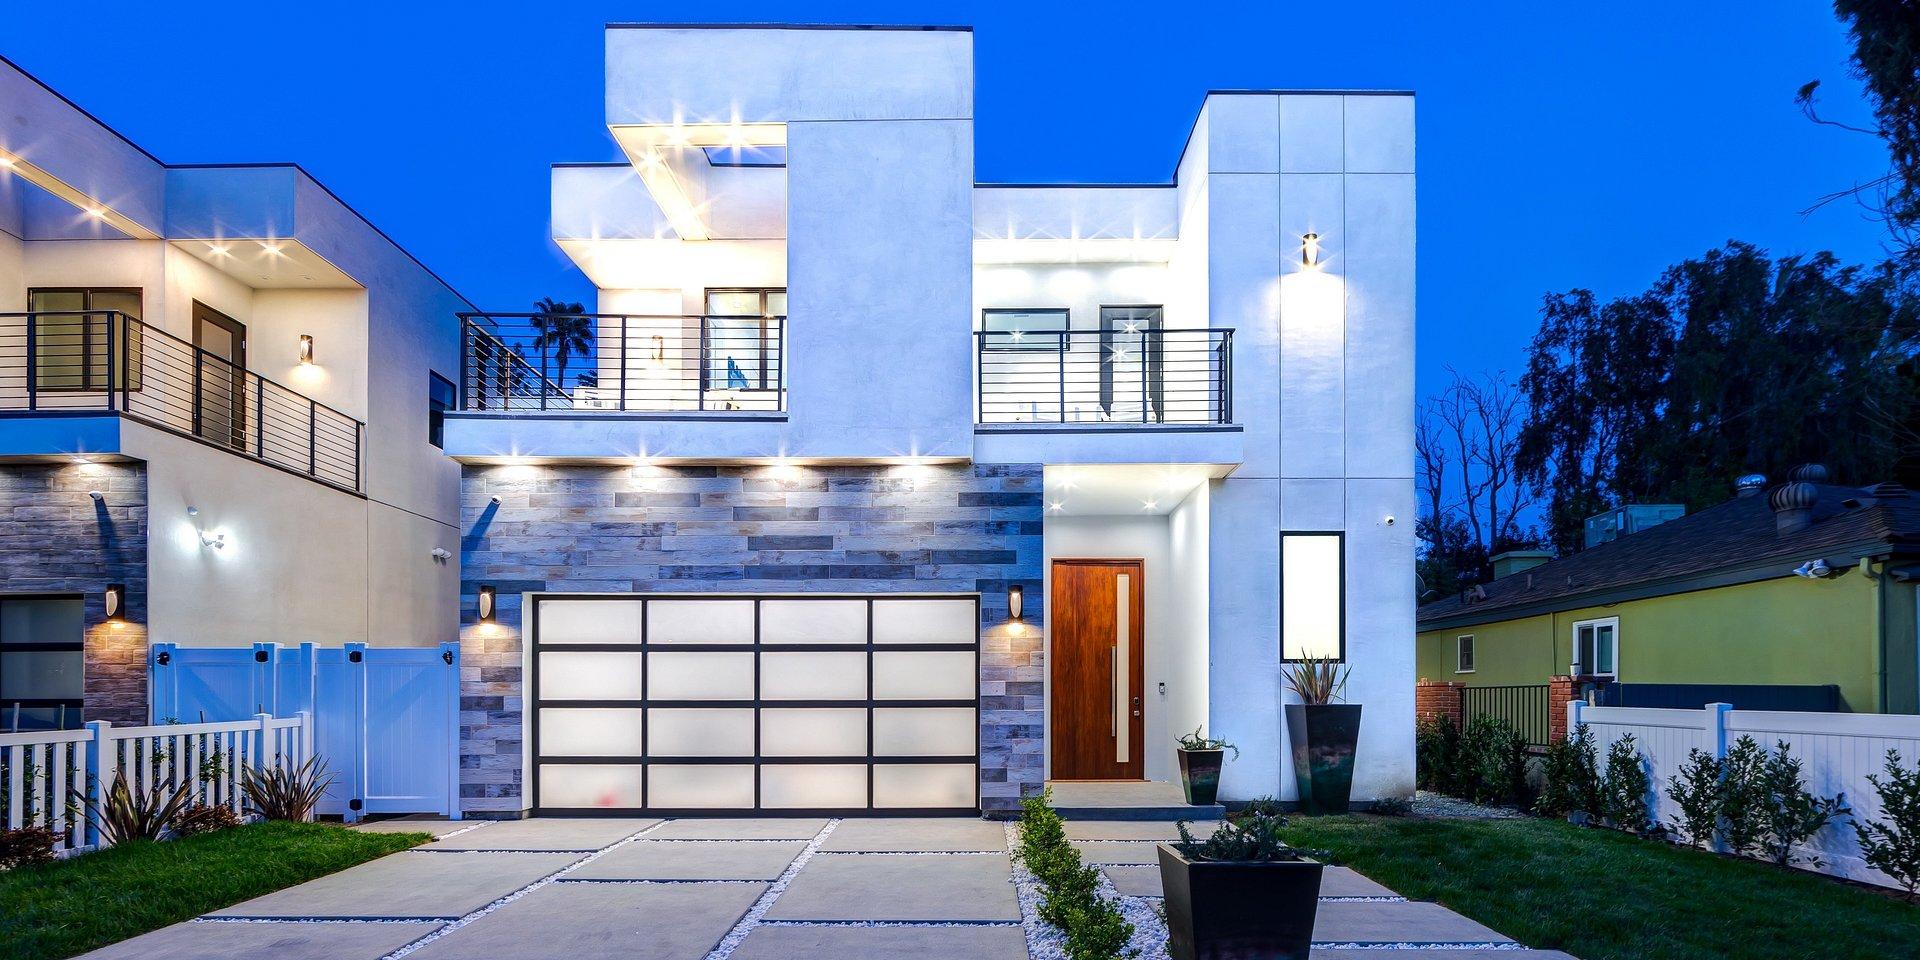 Coldwell Banker Residential Brokerage Lists Sherman Oaks Property for $2.199 Million